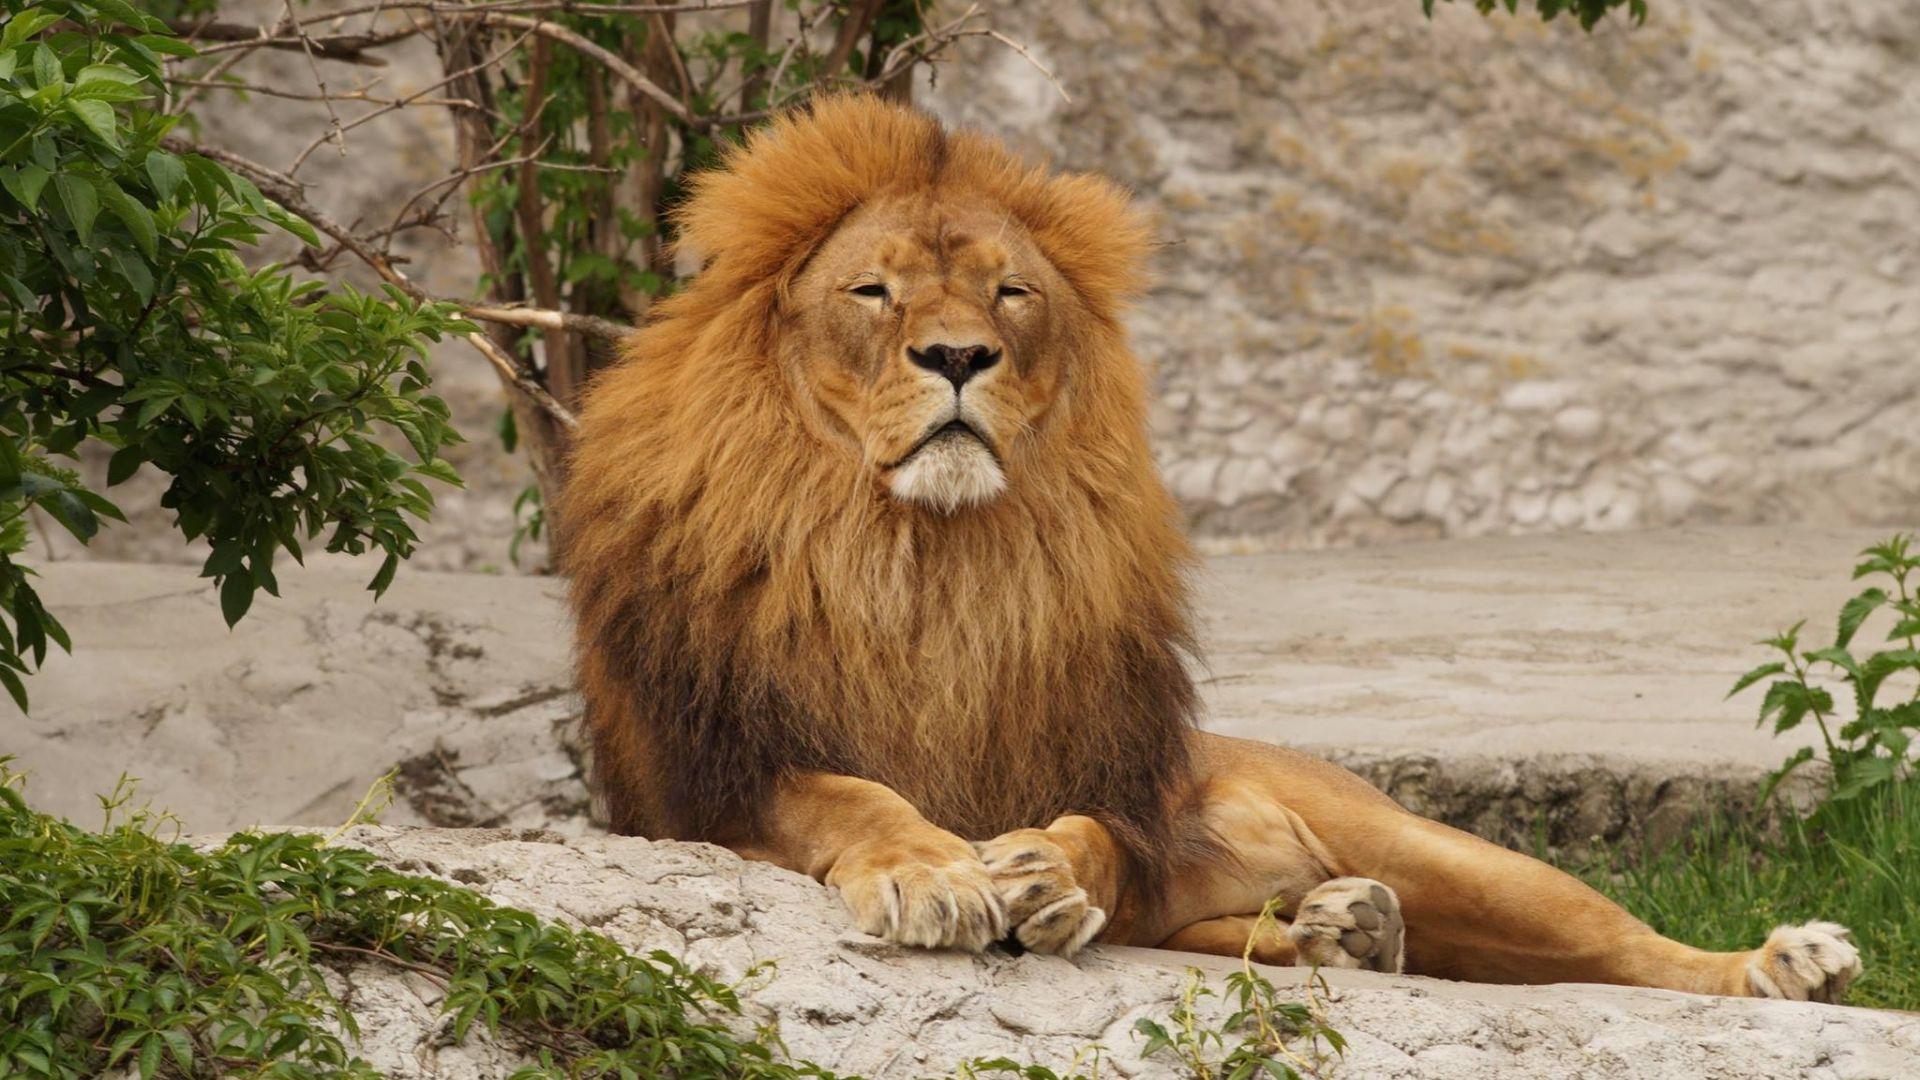 Desktop Wallpaper Mighty Beast, Predator, Lion, Animal, Hd Image ...